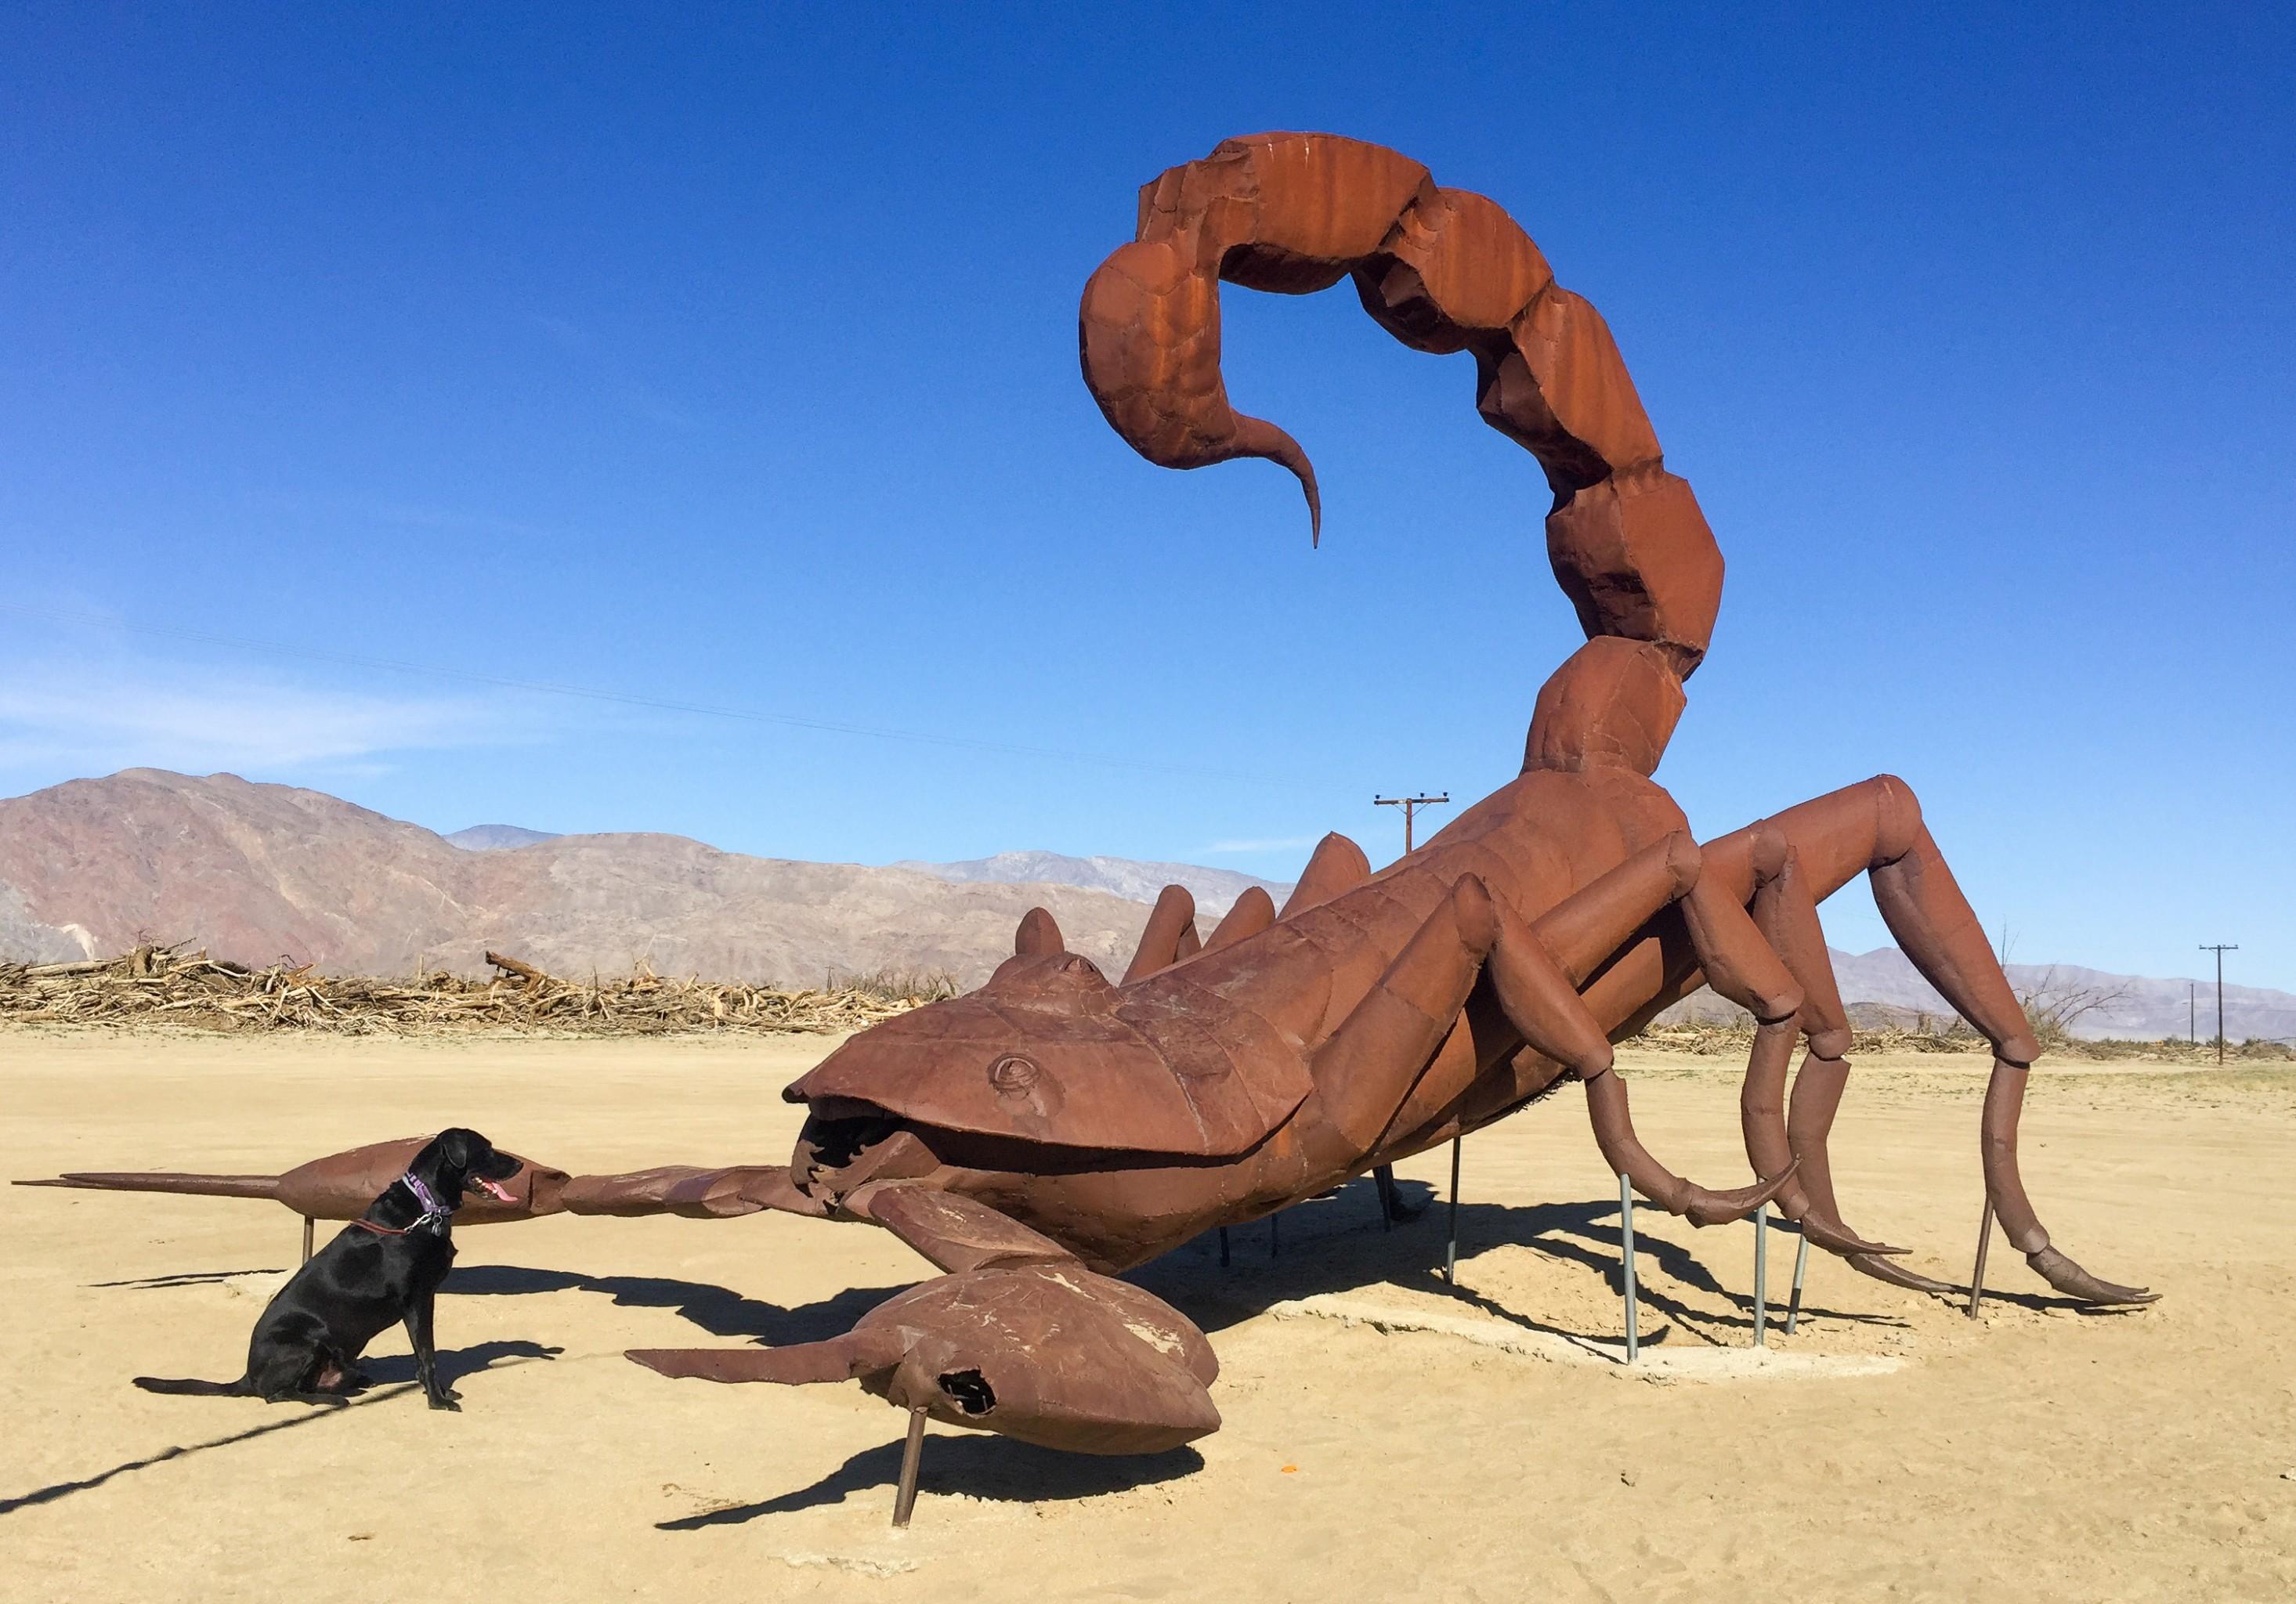 Life Rebooted Borrego Springs Sculpture Tour